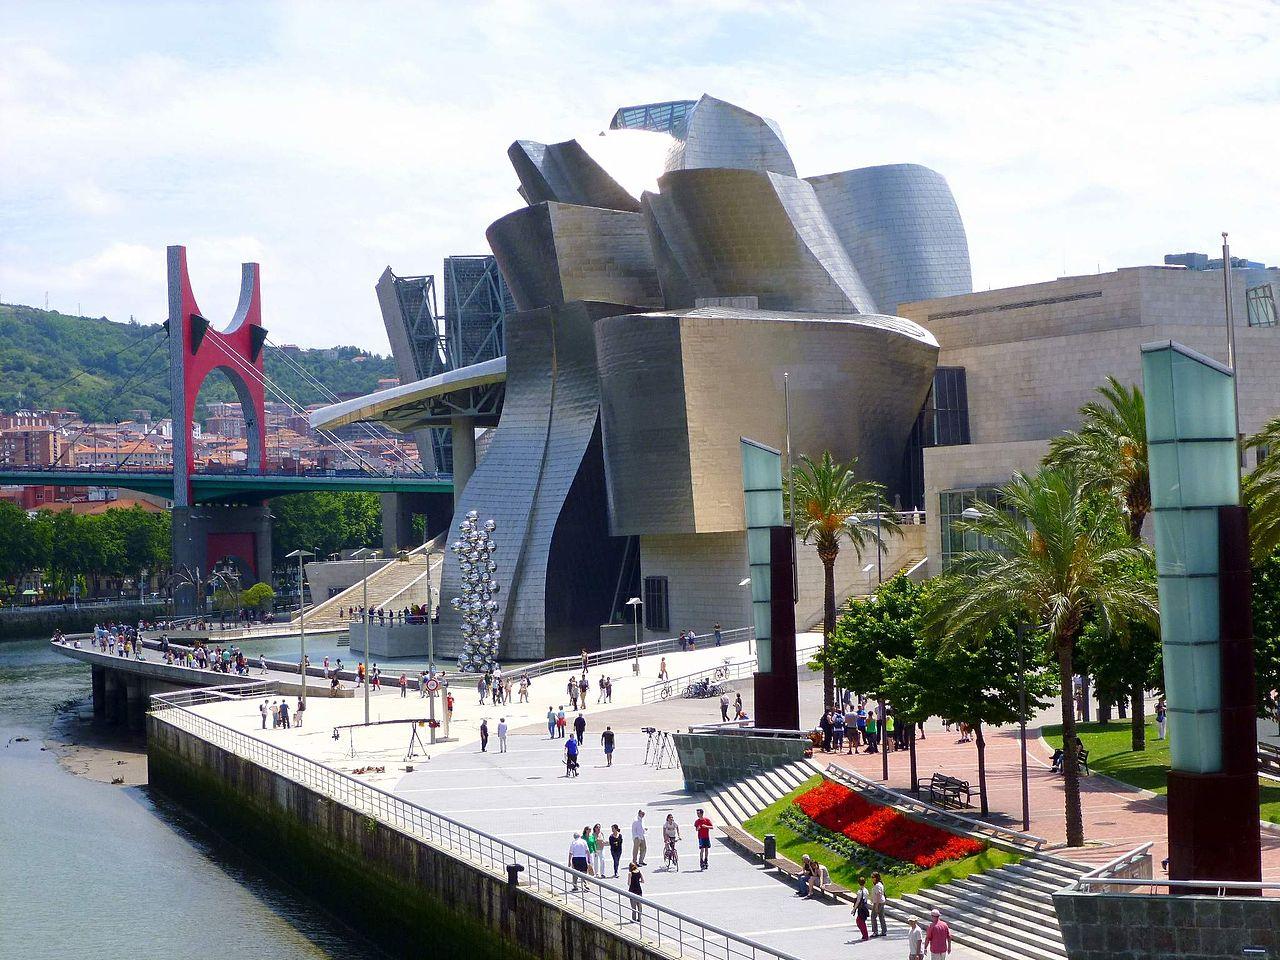 Музей Гуггенхайма в Бильбао, набережная